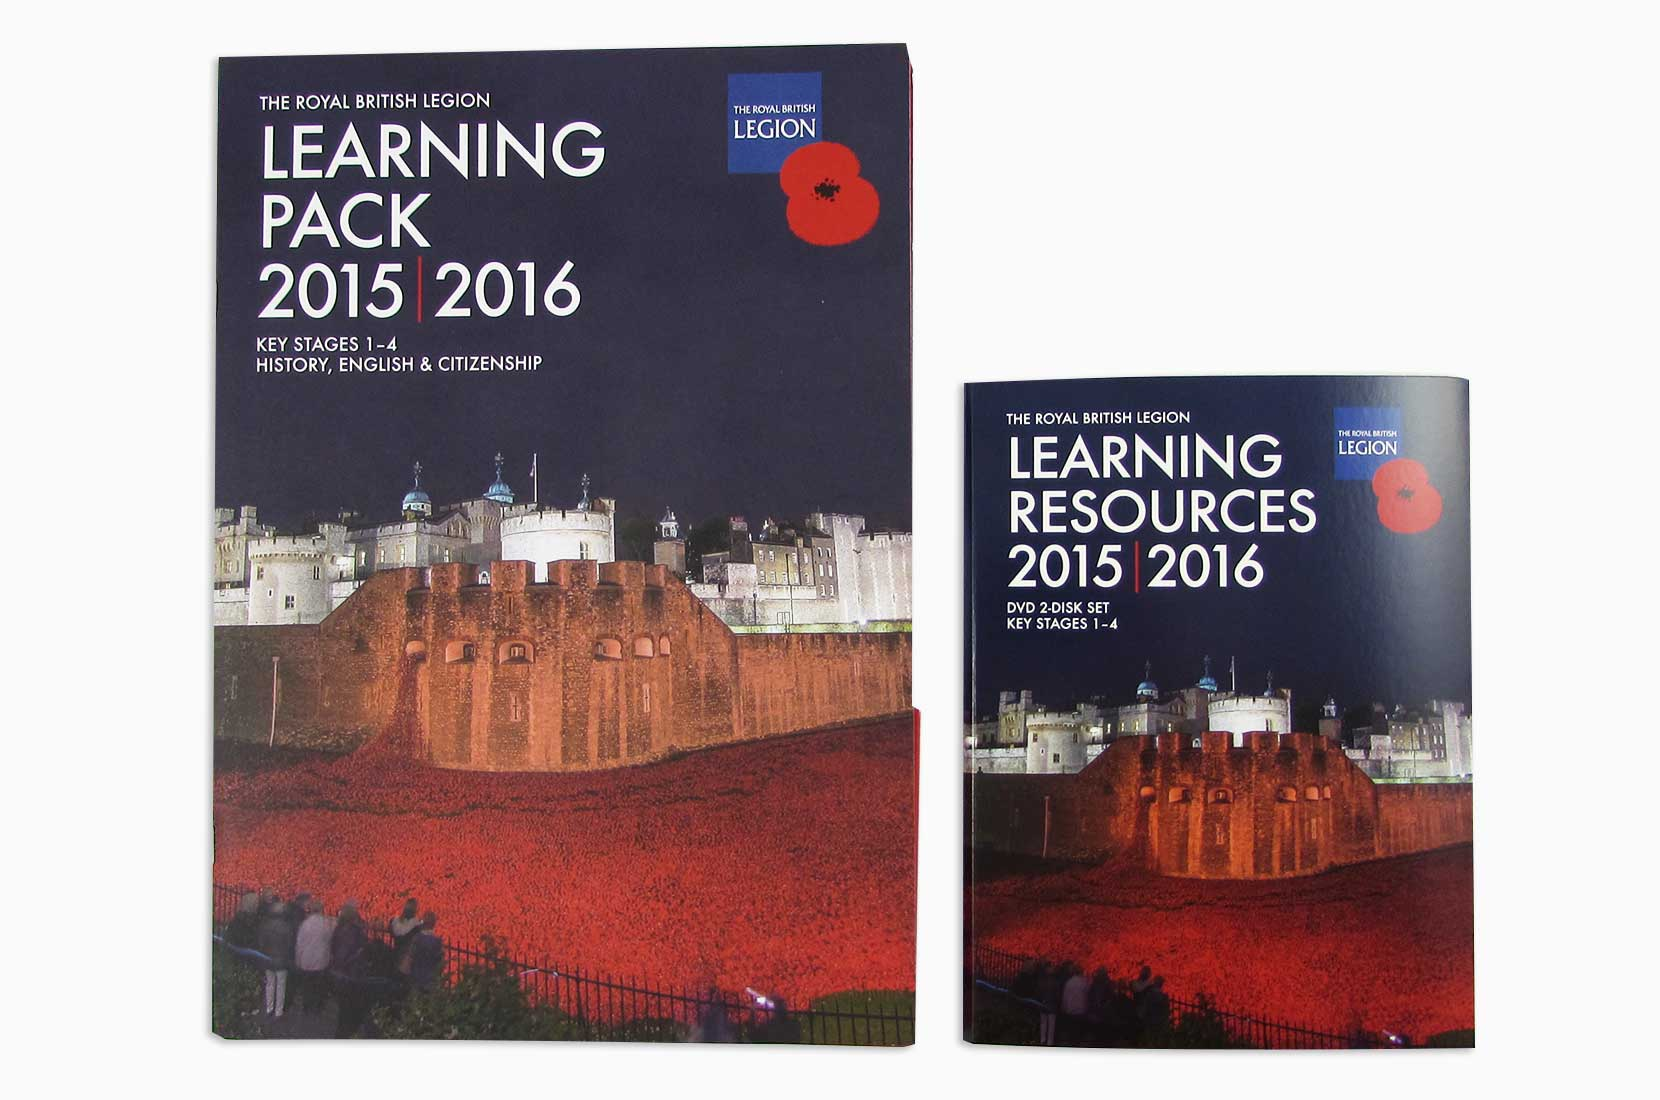 Royal British Legion Learning Pack 2015/16